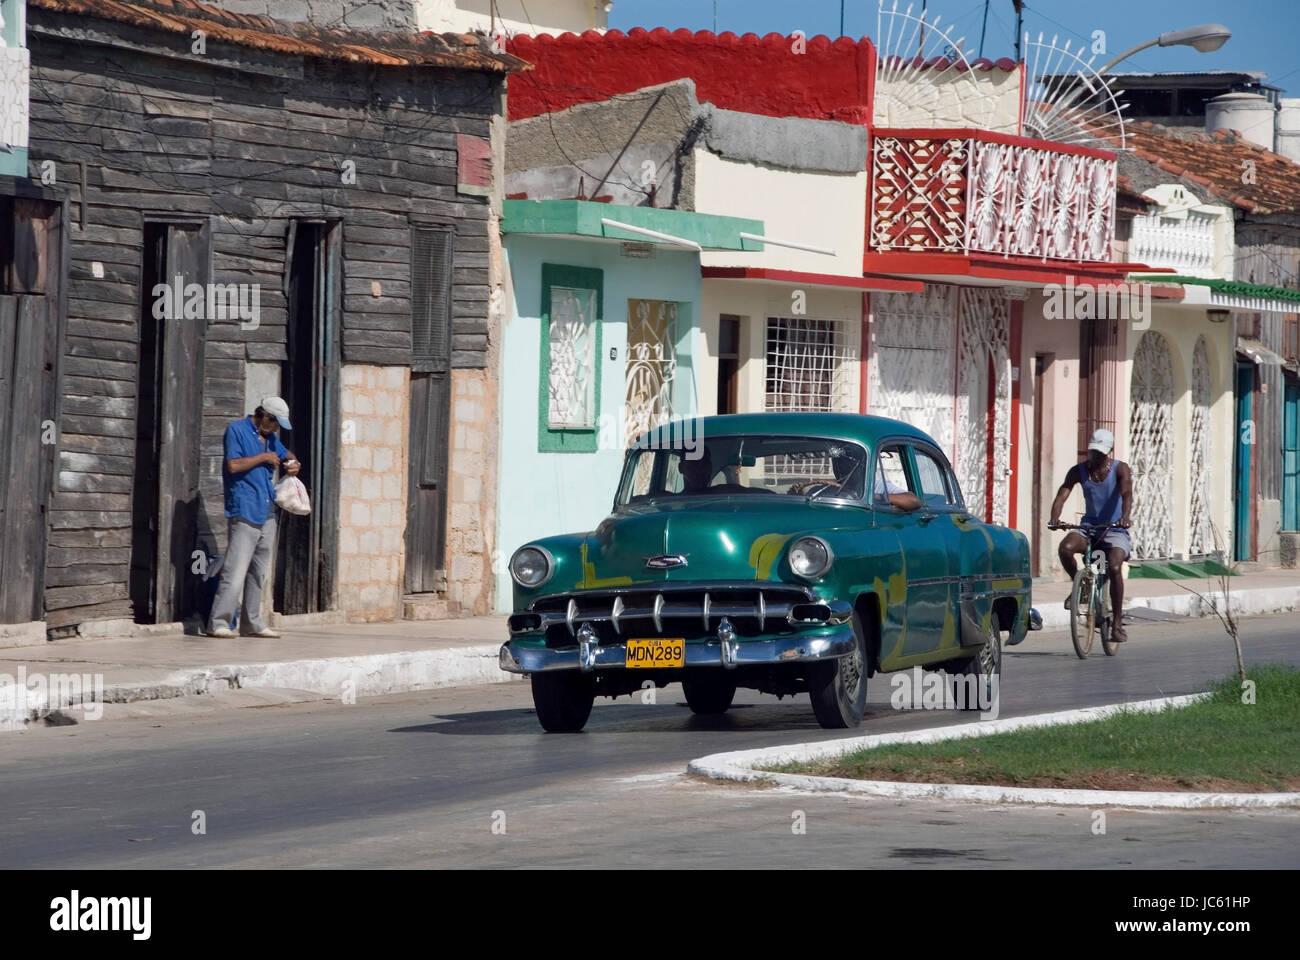 Kuba, Karibik, Varadero, Oldtimer, Kuba, Karibik, Oldtimer Stockbild